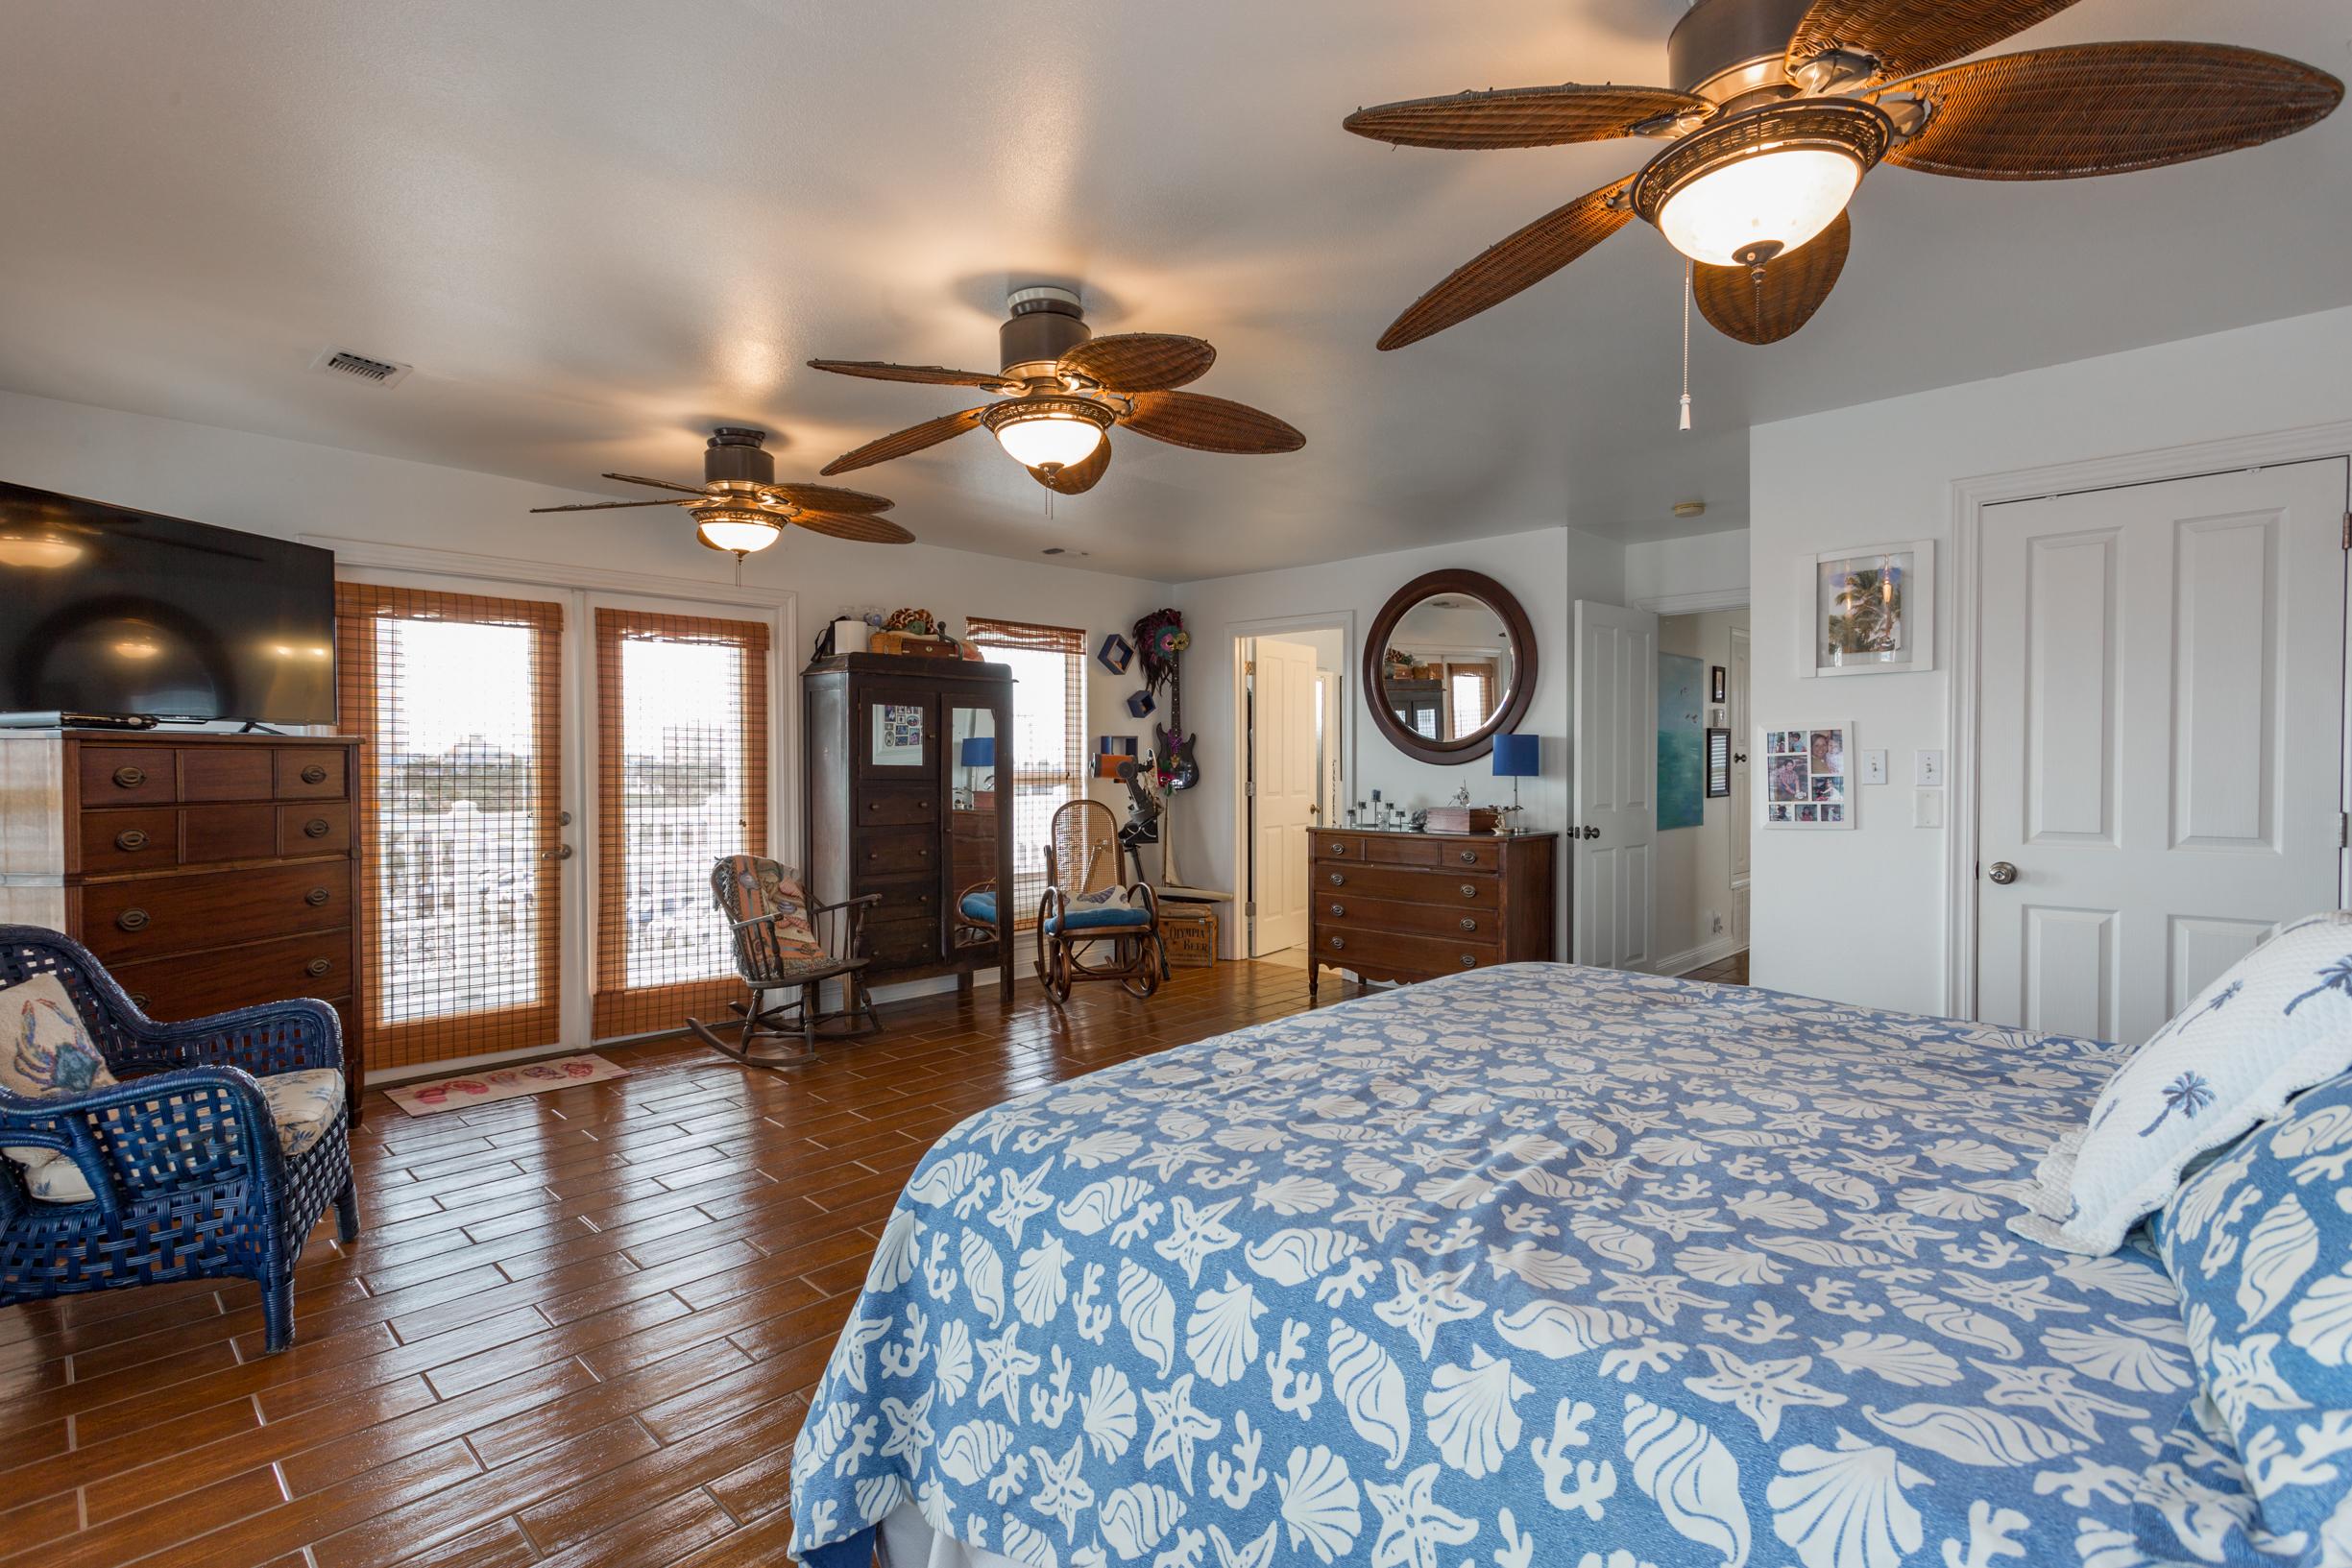 White Sands Cottage 501 Life's a Beach House Townhouse rental in White Sands Pensacola Beach in Pensacola Beach Florida - #27